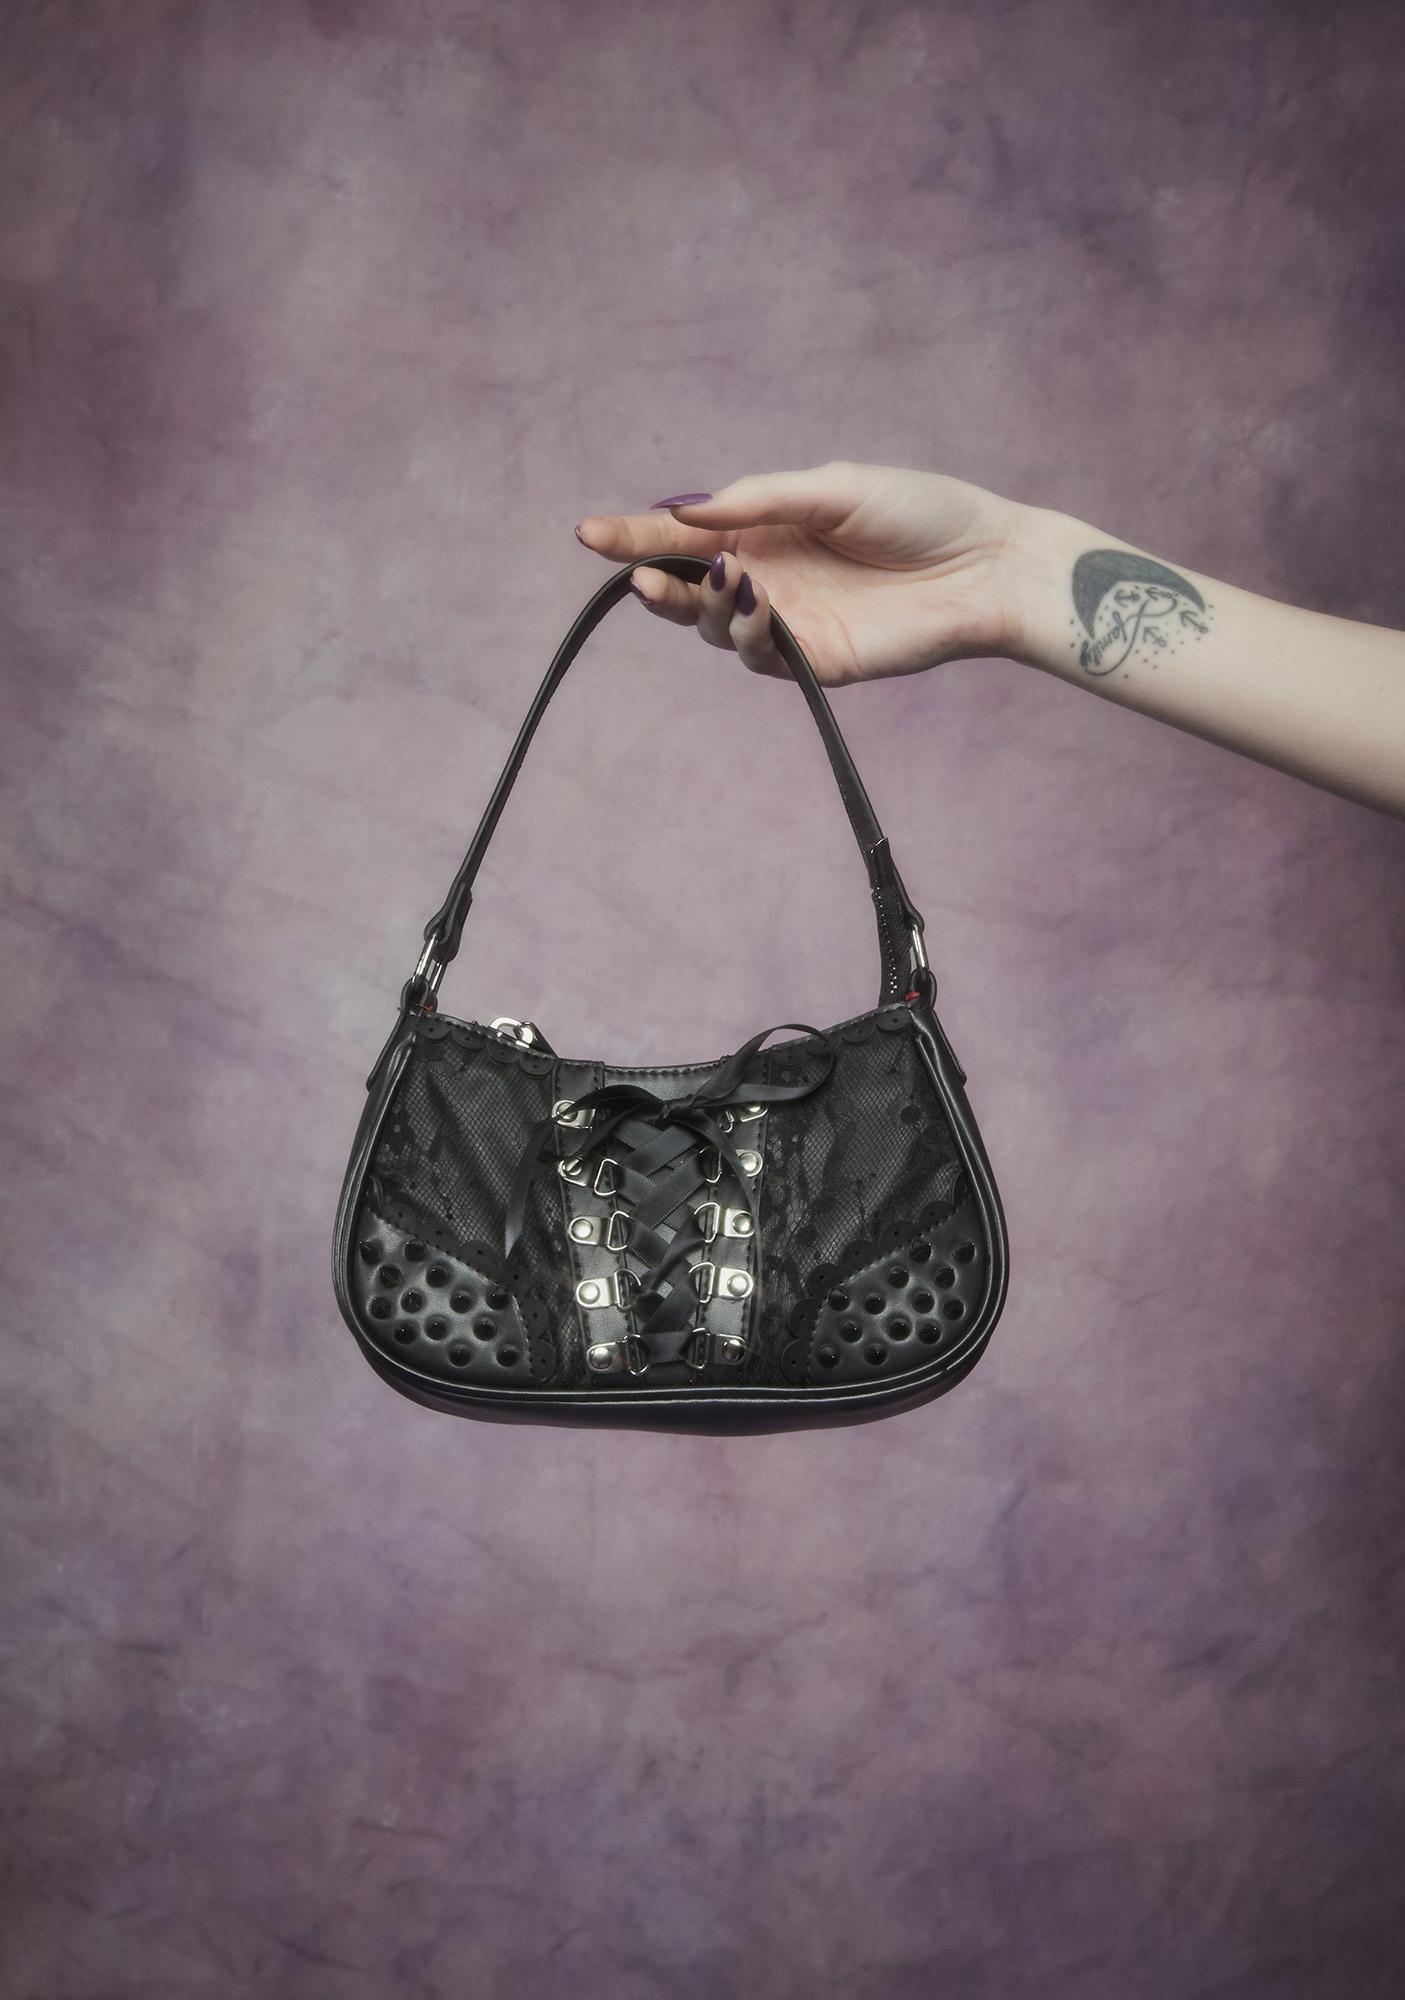 Widow Dangerously Amorous Corset Bag